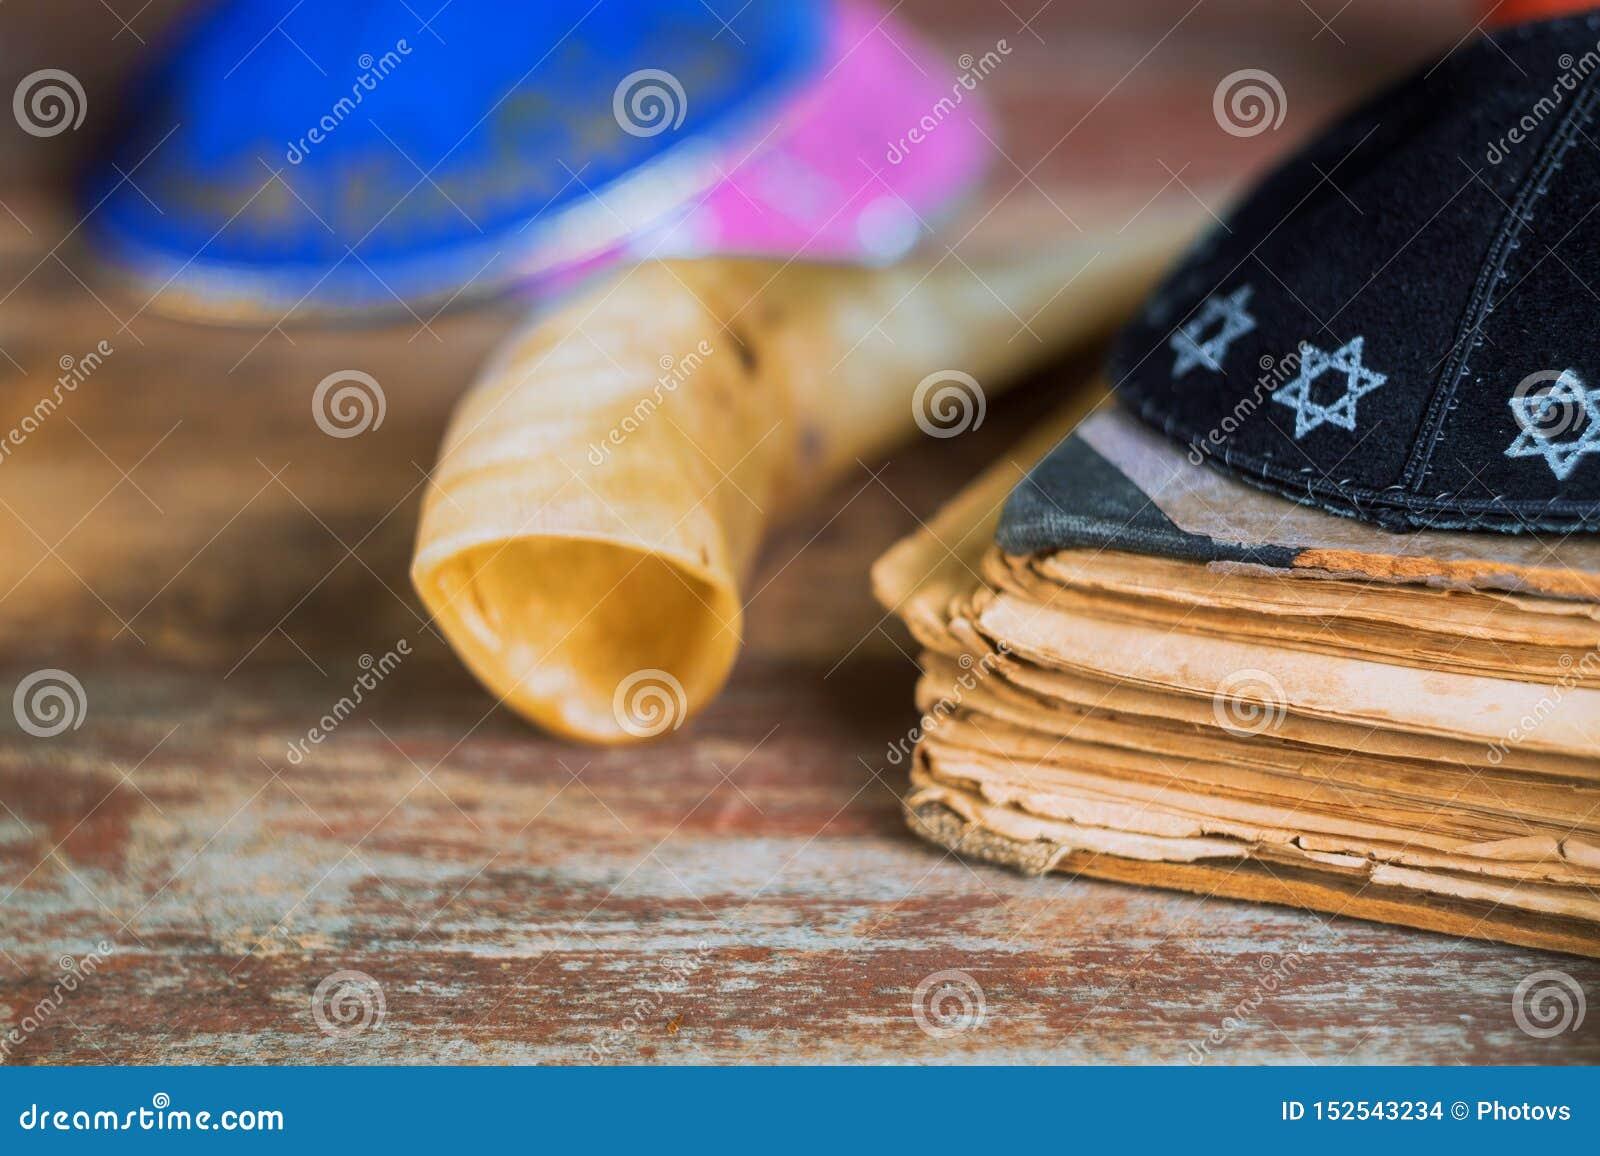 , Shemini Atzeret Shmini Atzeret und der Simchat Thoren Feiertag Yom Kippurs, jüdischer neuen Jahres Rosh Hashanah Hashana Shofar